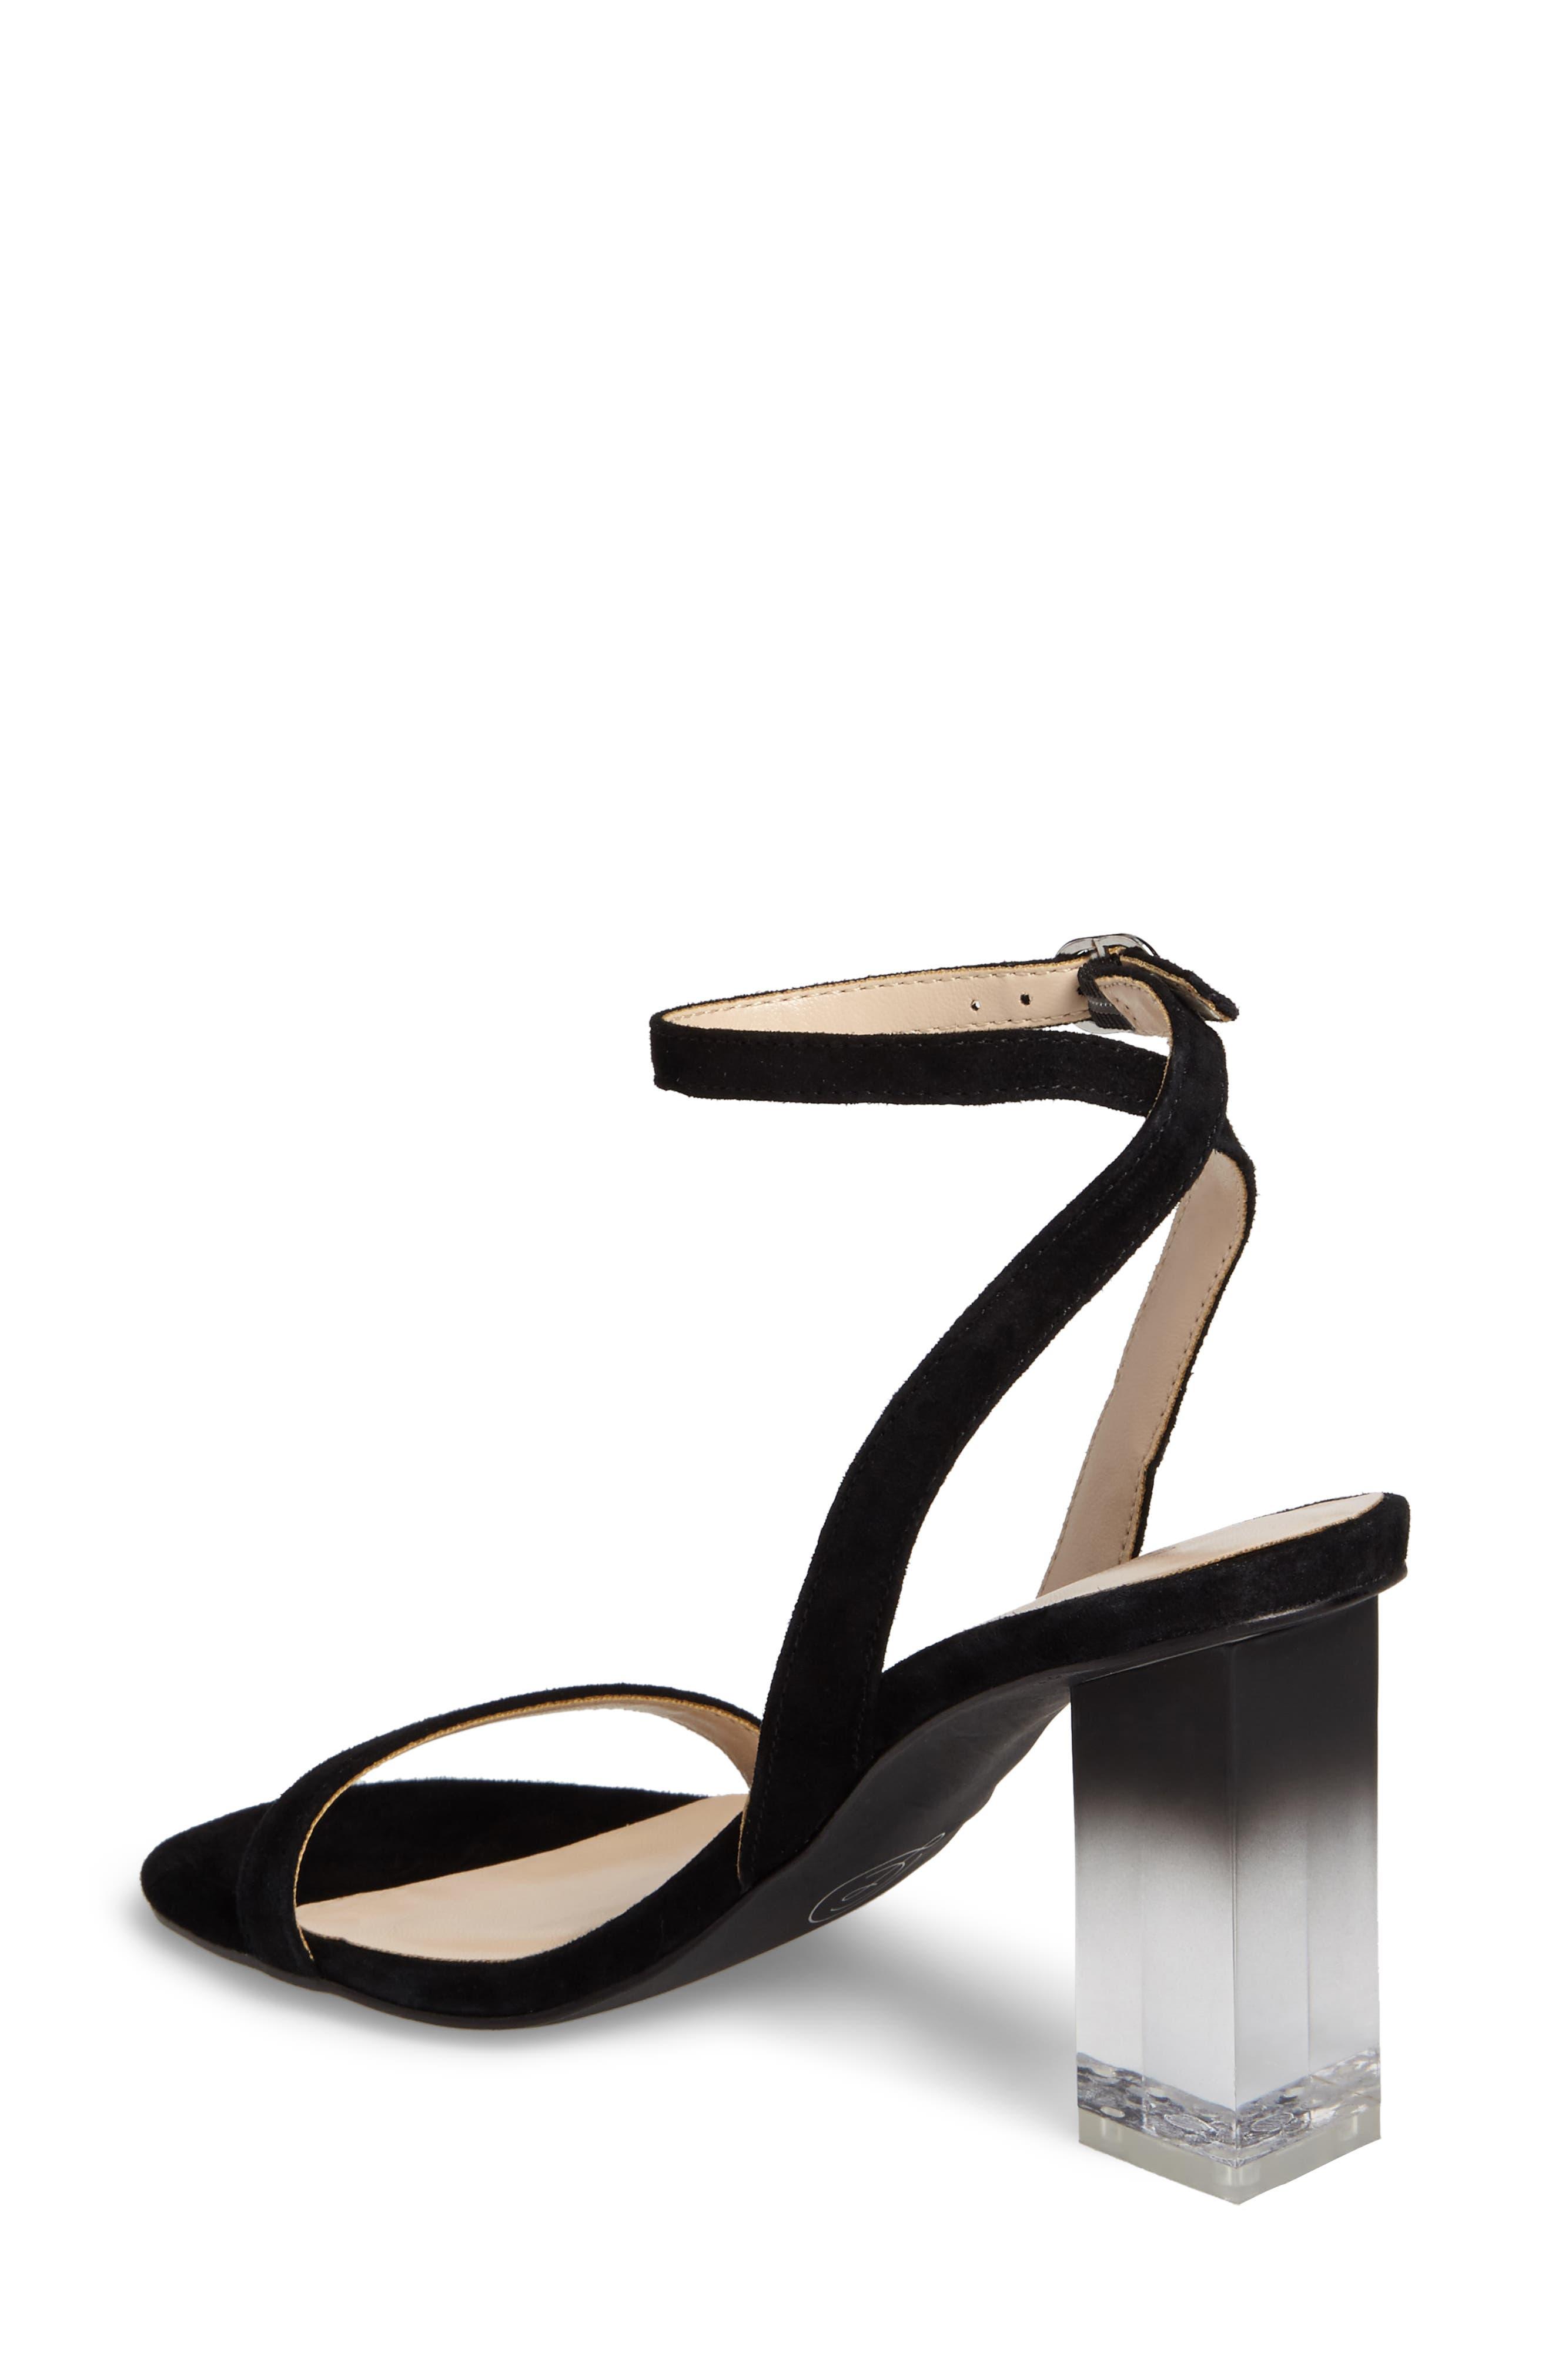 Shanie Clear Heel Sandal,                             Alternate thumbnail 2, color,                             001